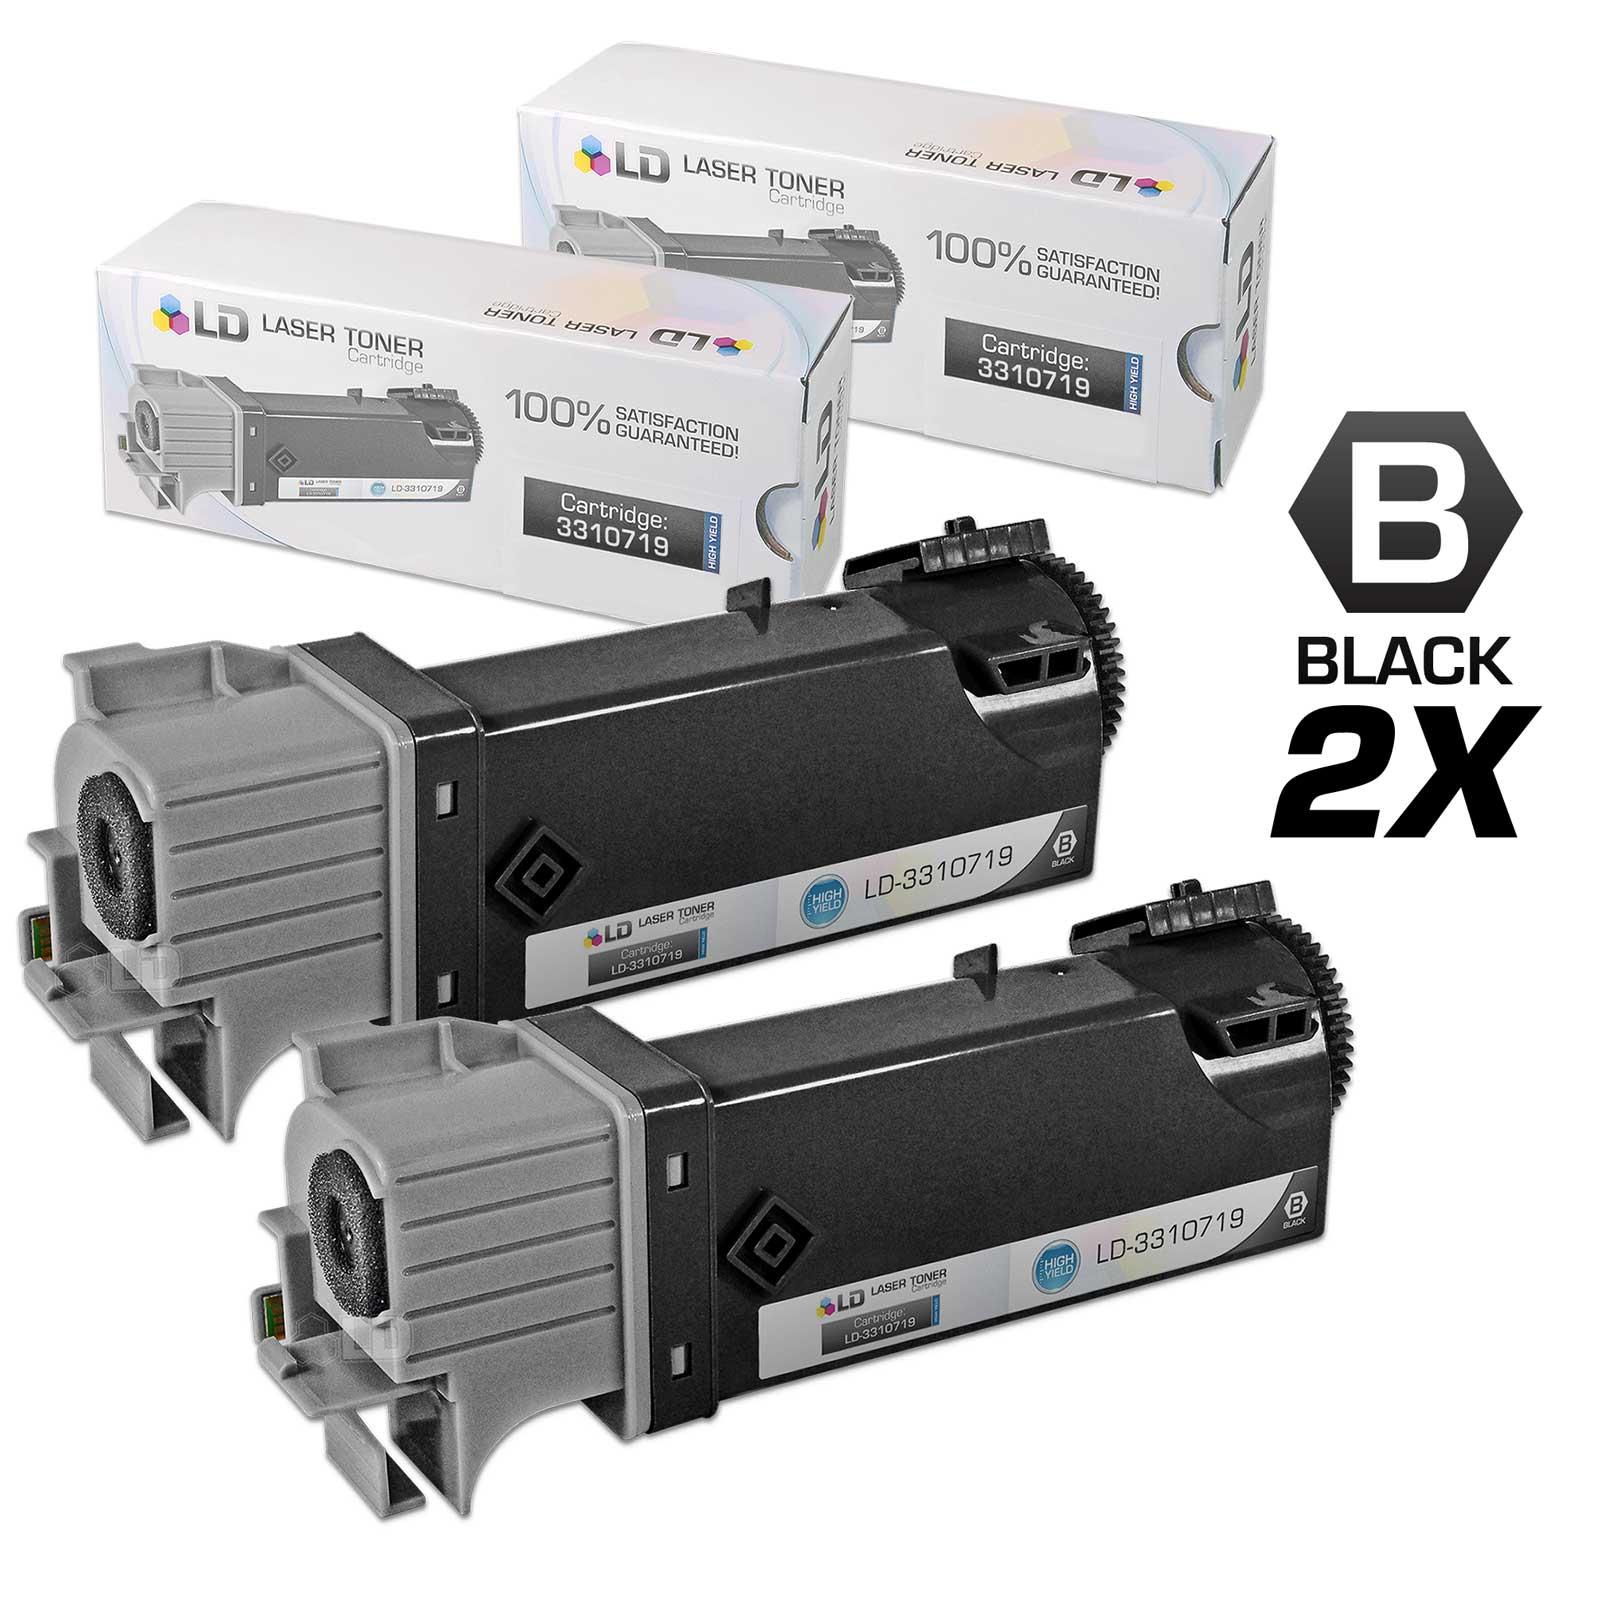 LD Compatible Dell 2150 / 2155 High Yield Toner Cartridges: 331-0719 BLK / 331-0716 C / 331-0717 M / 331-0718 Y